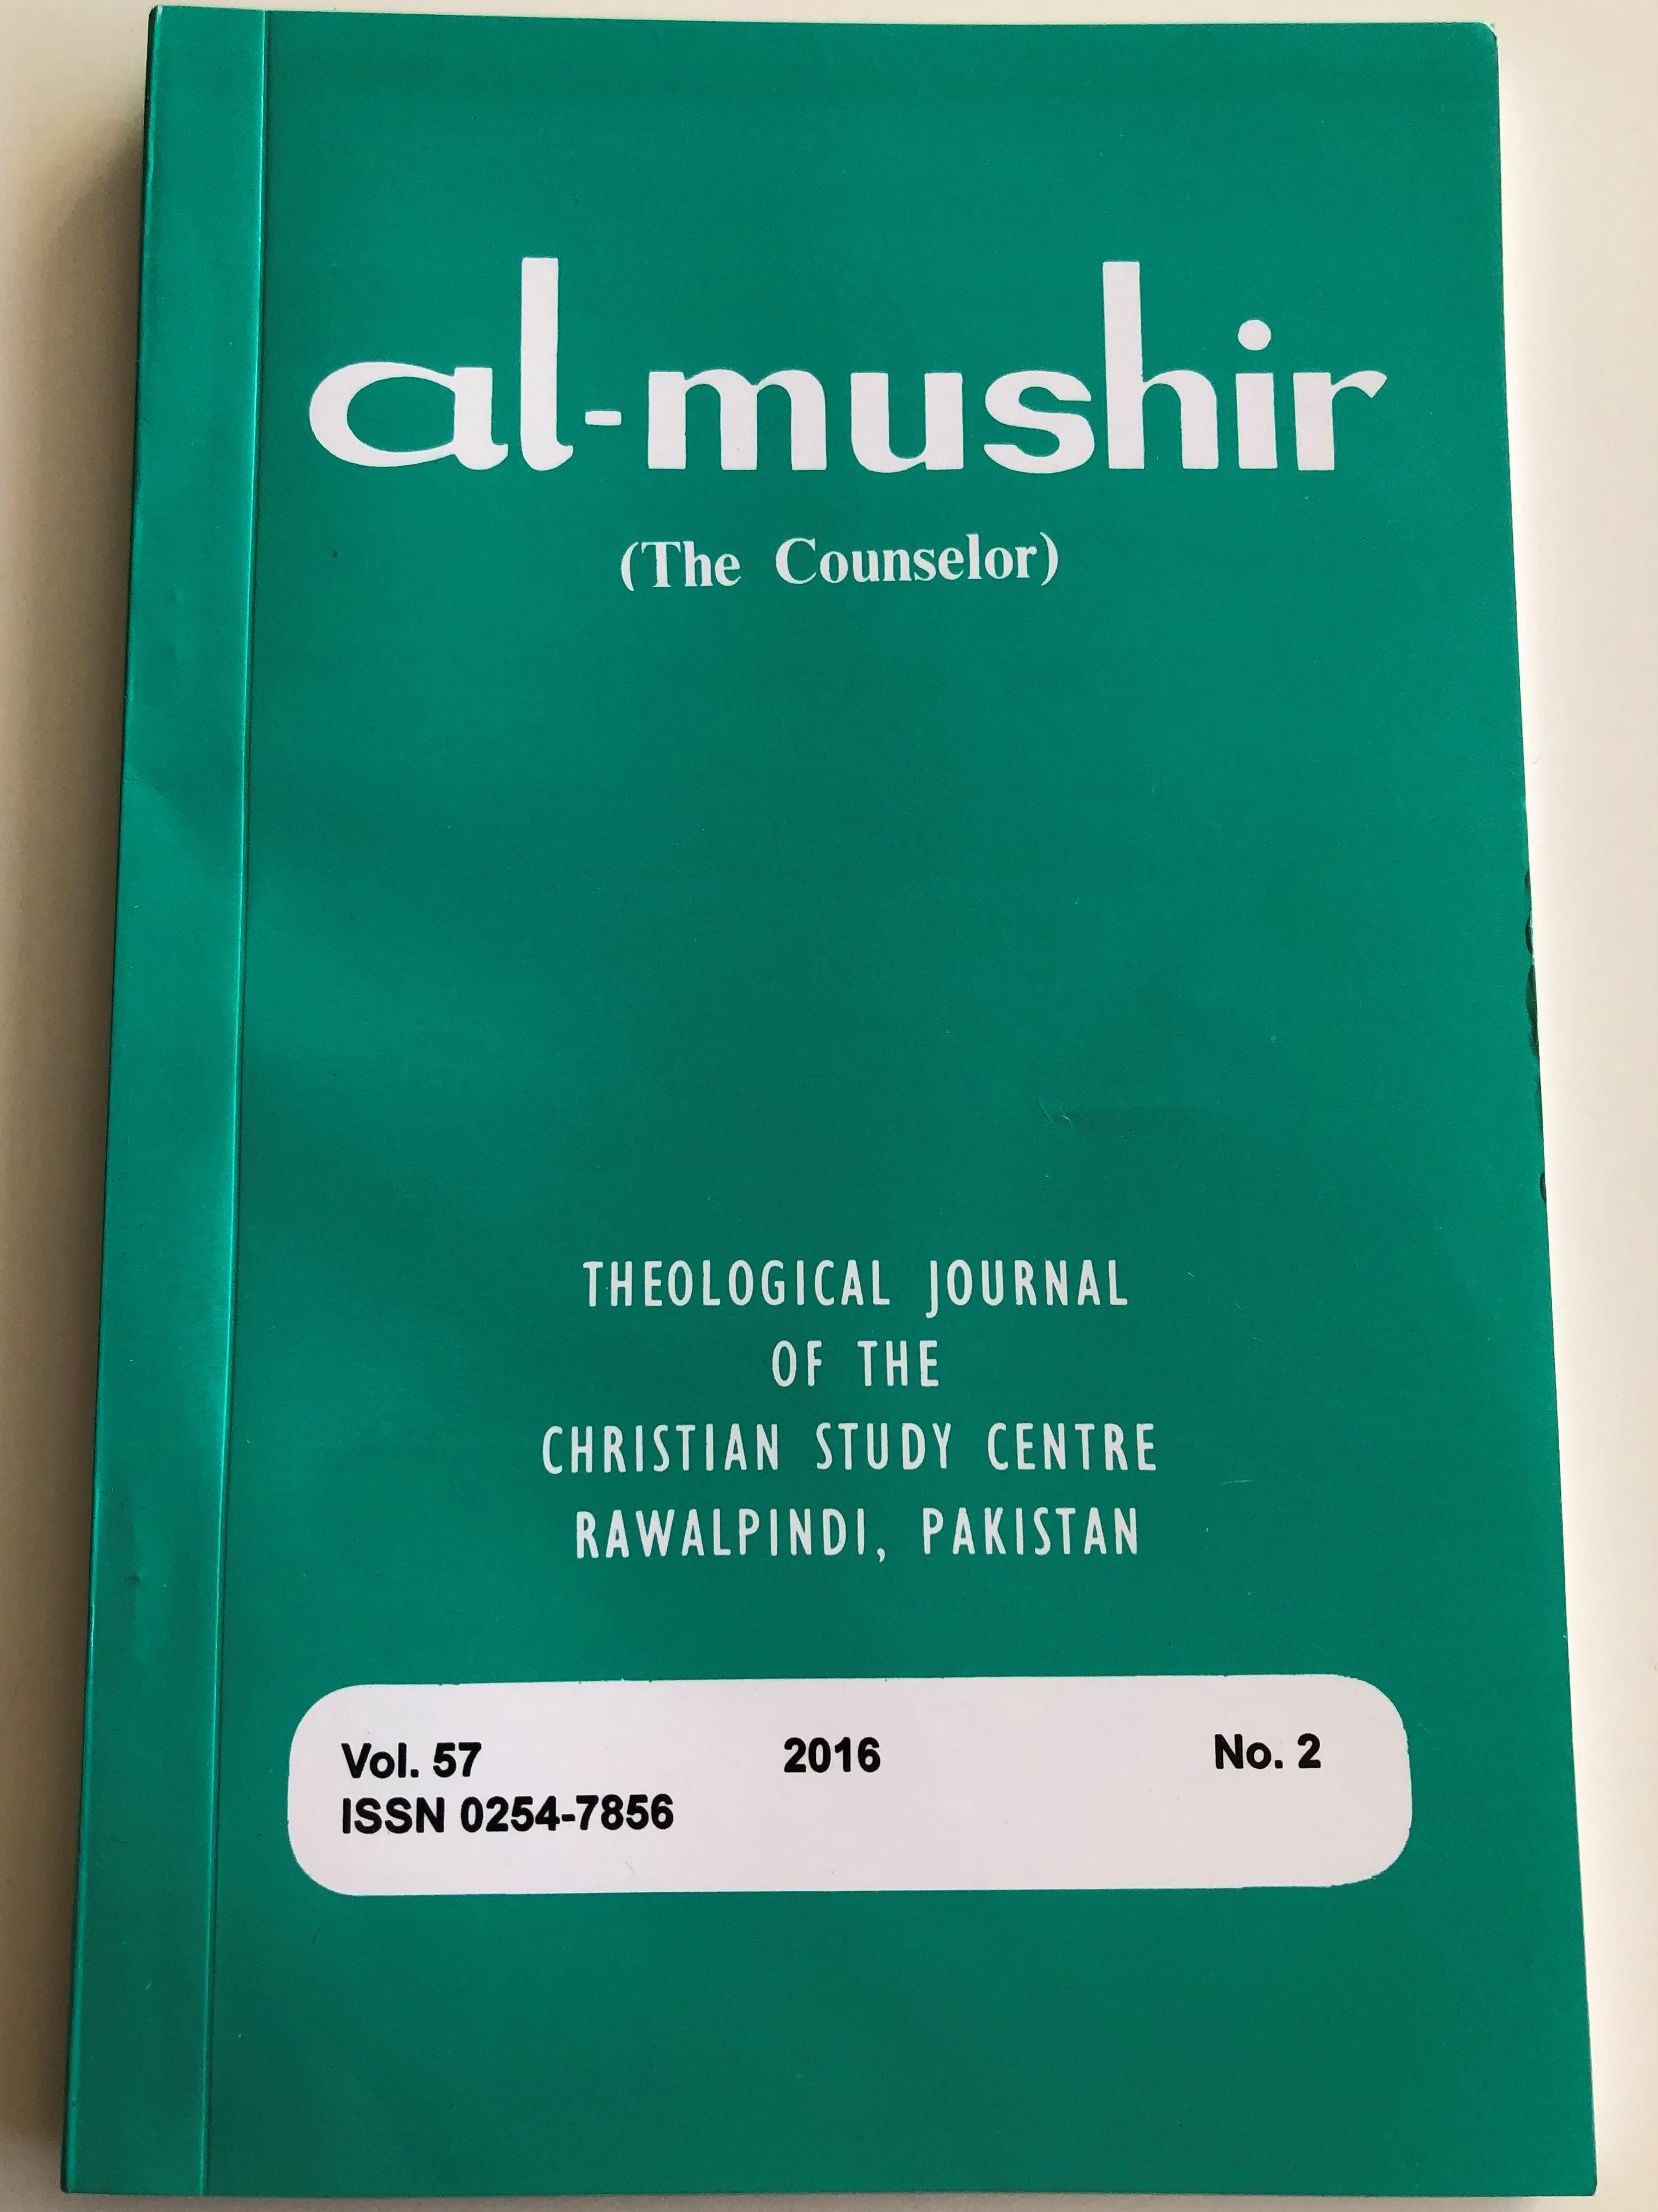 al-mushir-the-counselor-volume-57.-no.-2-1.jpg